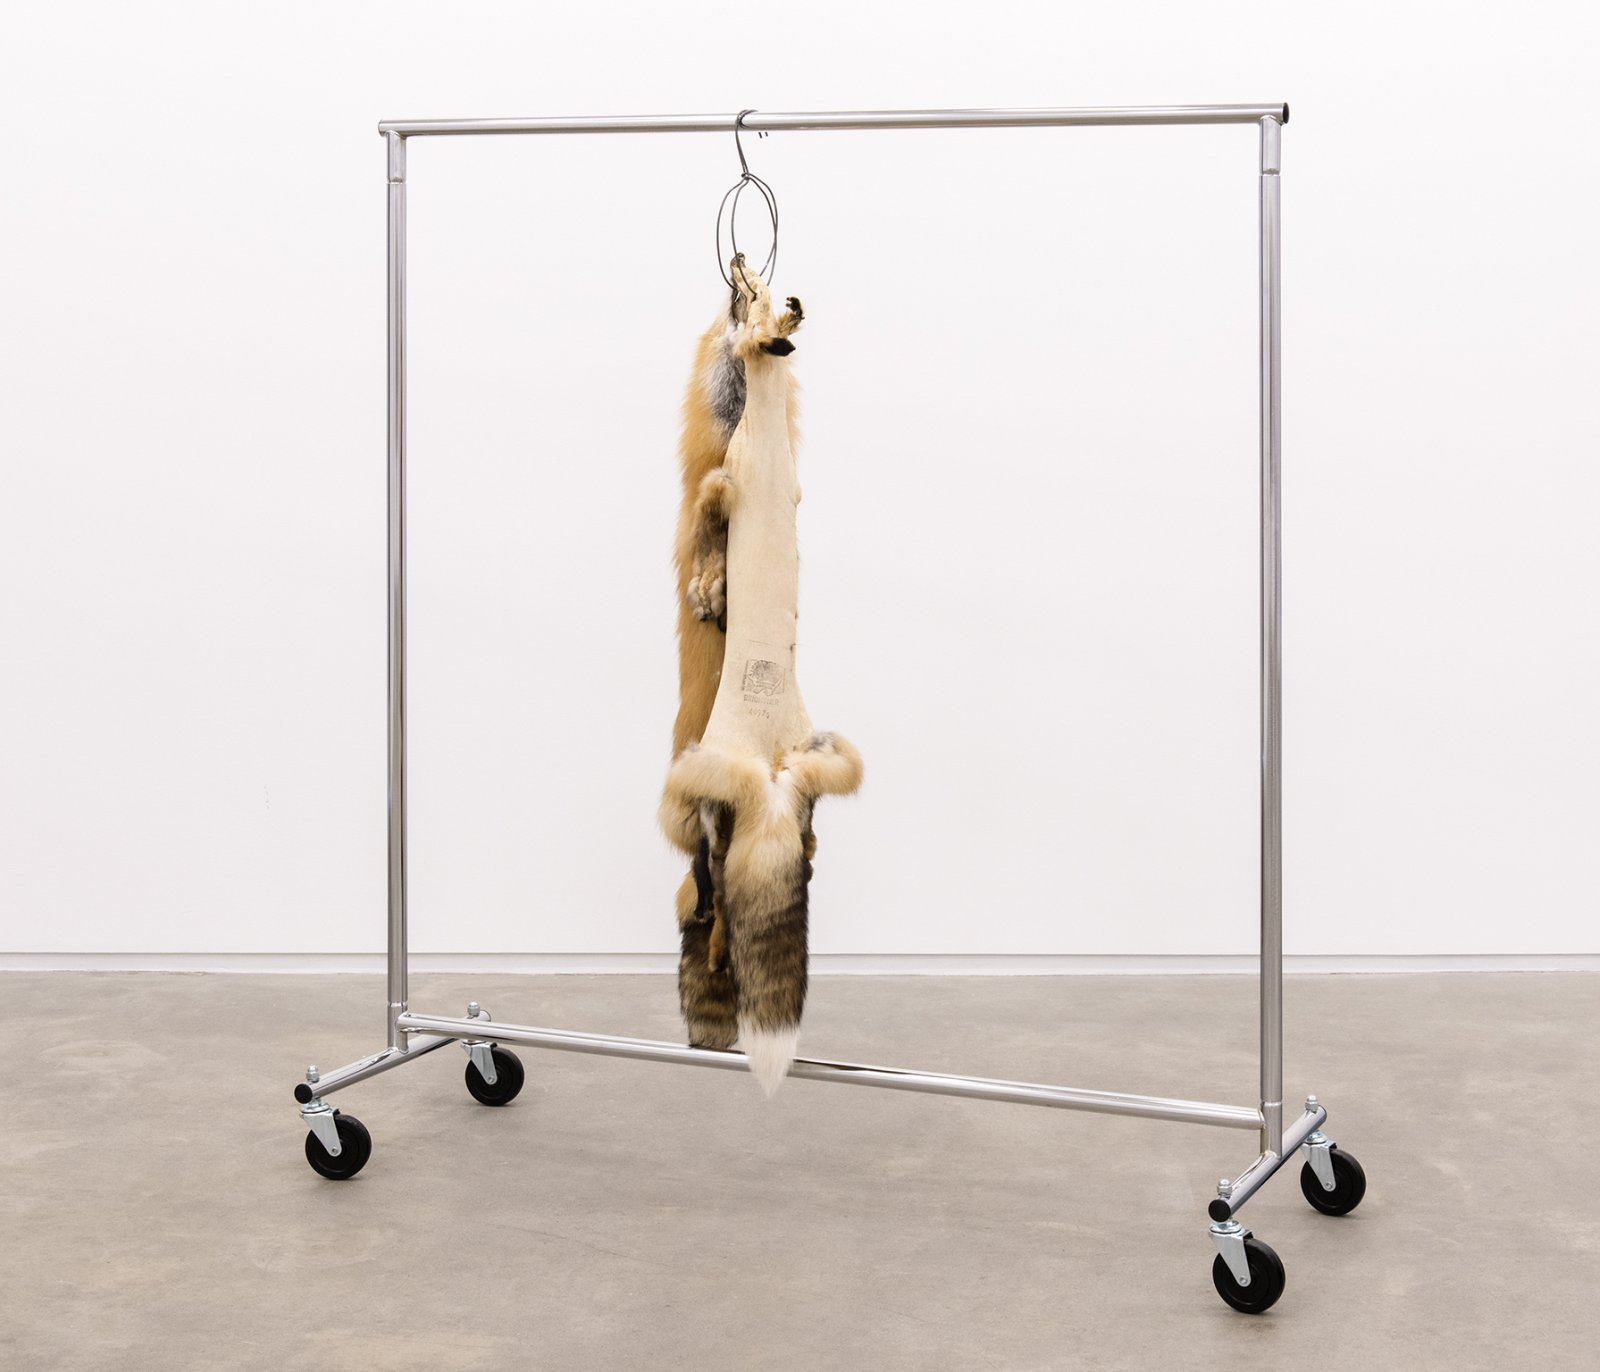 Duane Linklater, Kiss, 2014, fox furs, garment rack, hangers, 66 x 60 x 20 in. (168 x 151 x 52 cm)